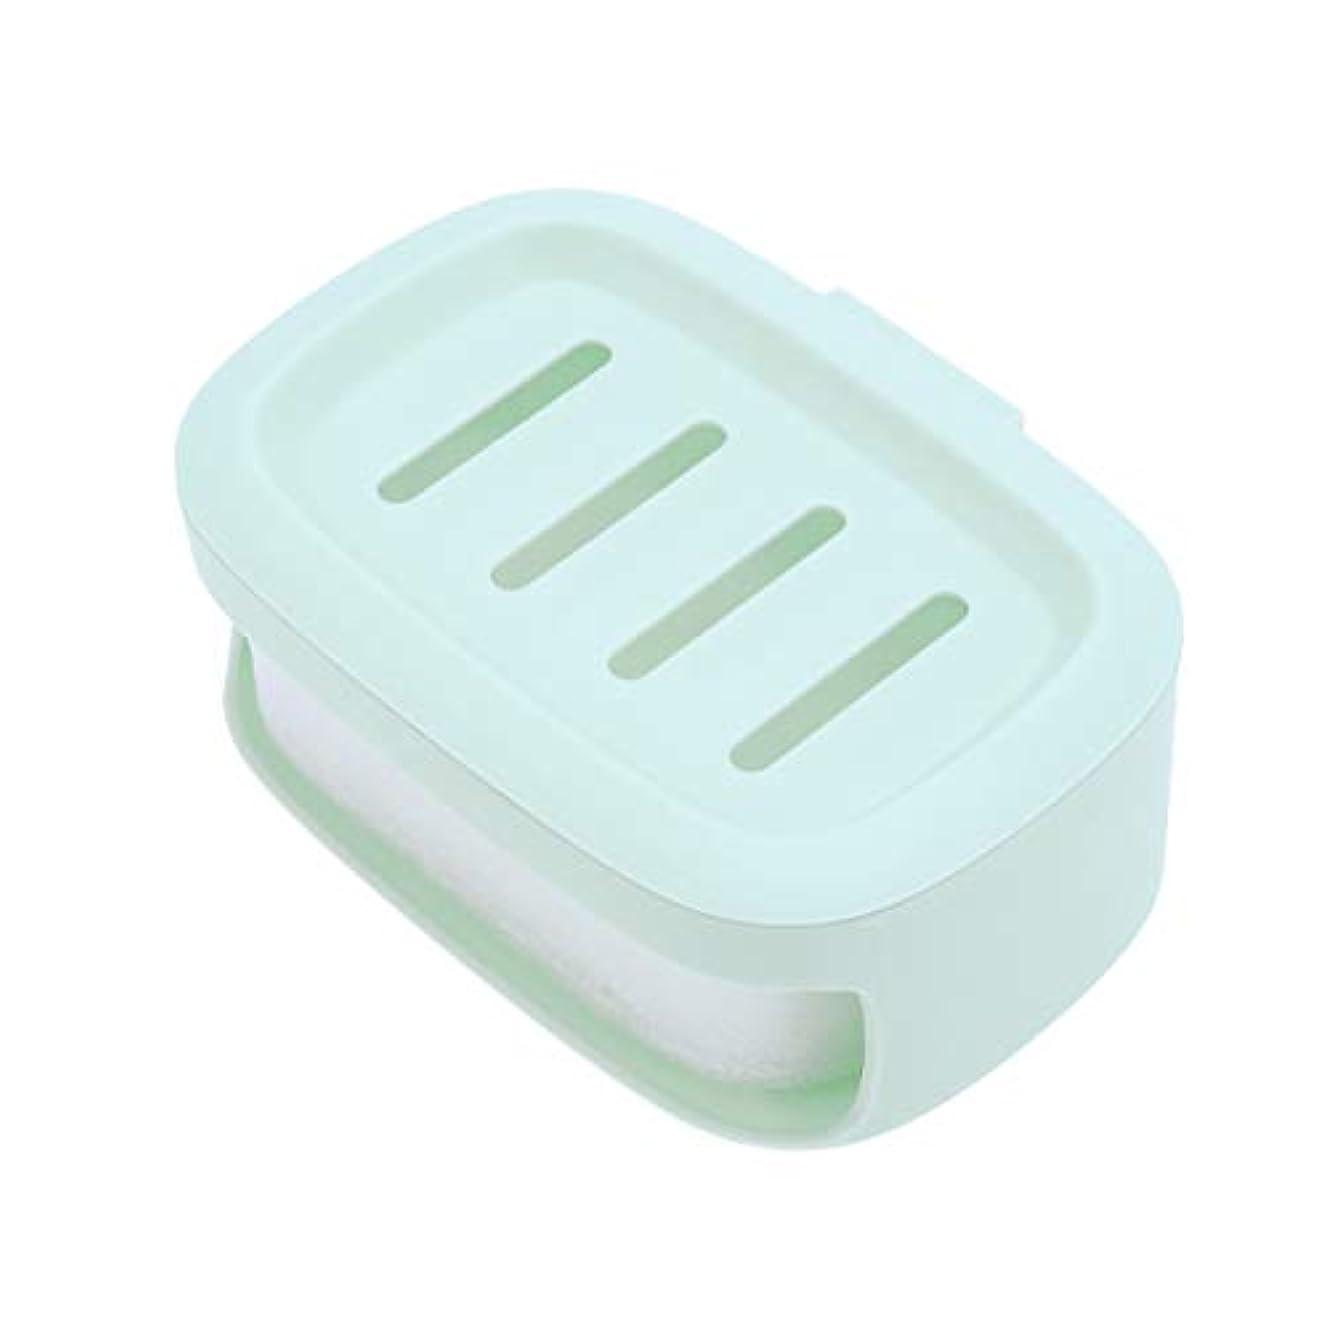 HEALIFTY ソープボックス防水ソープコンテナバスルームソープ収納ケースソープホルダー(グリーン)